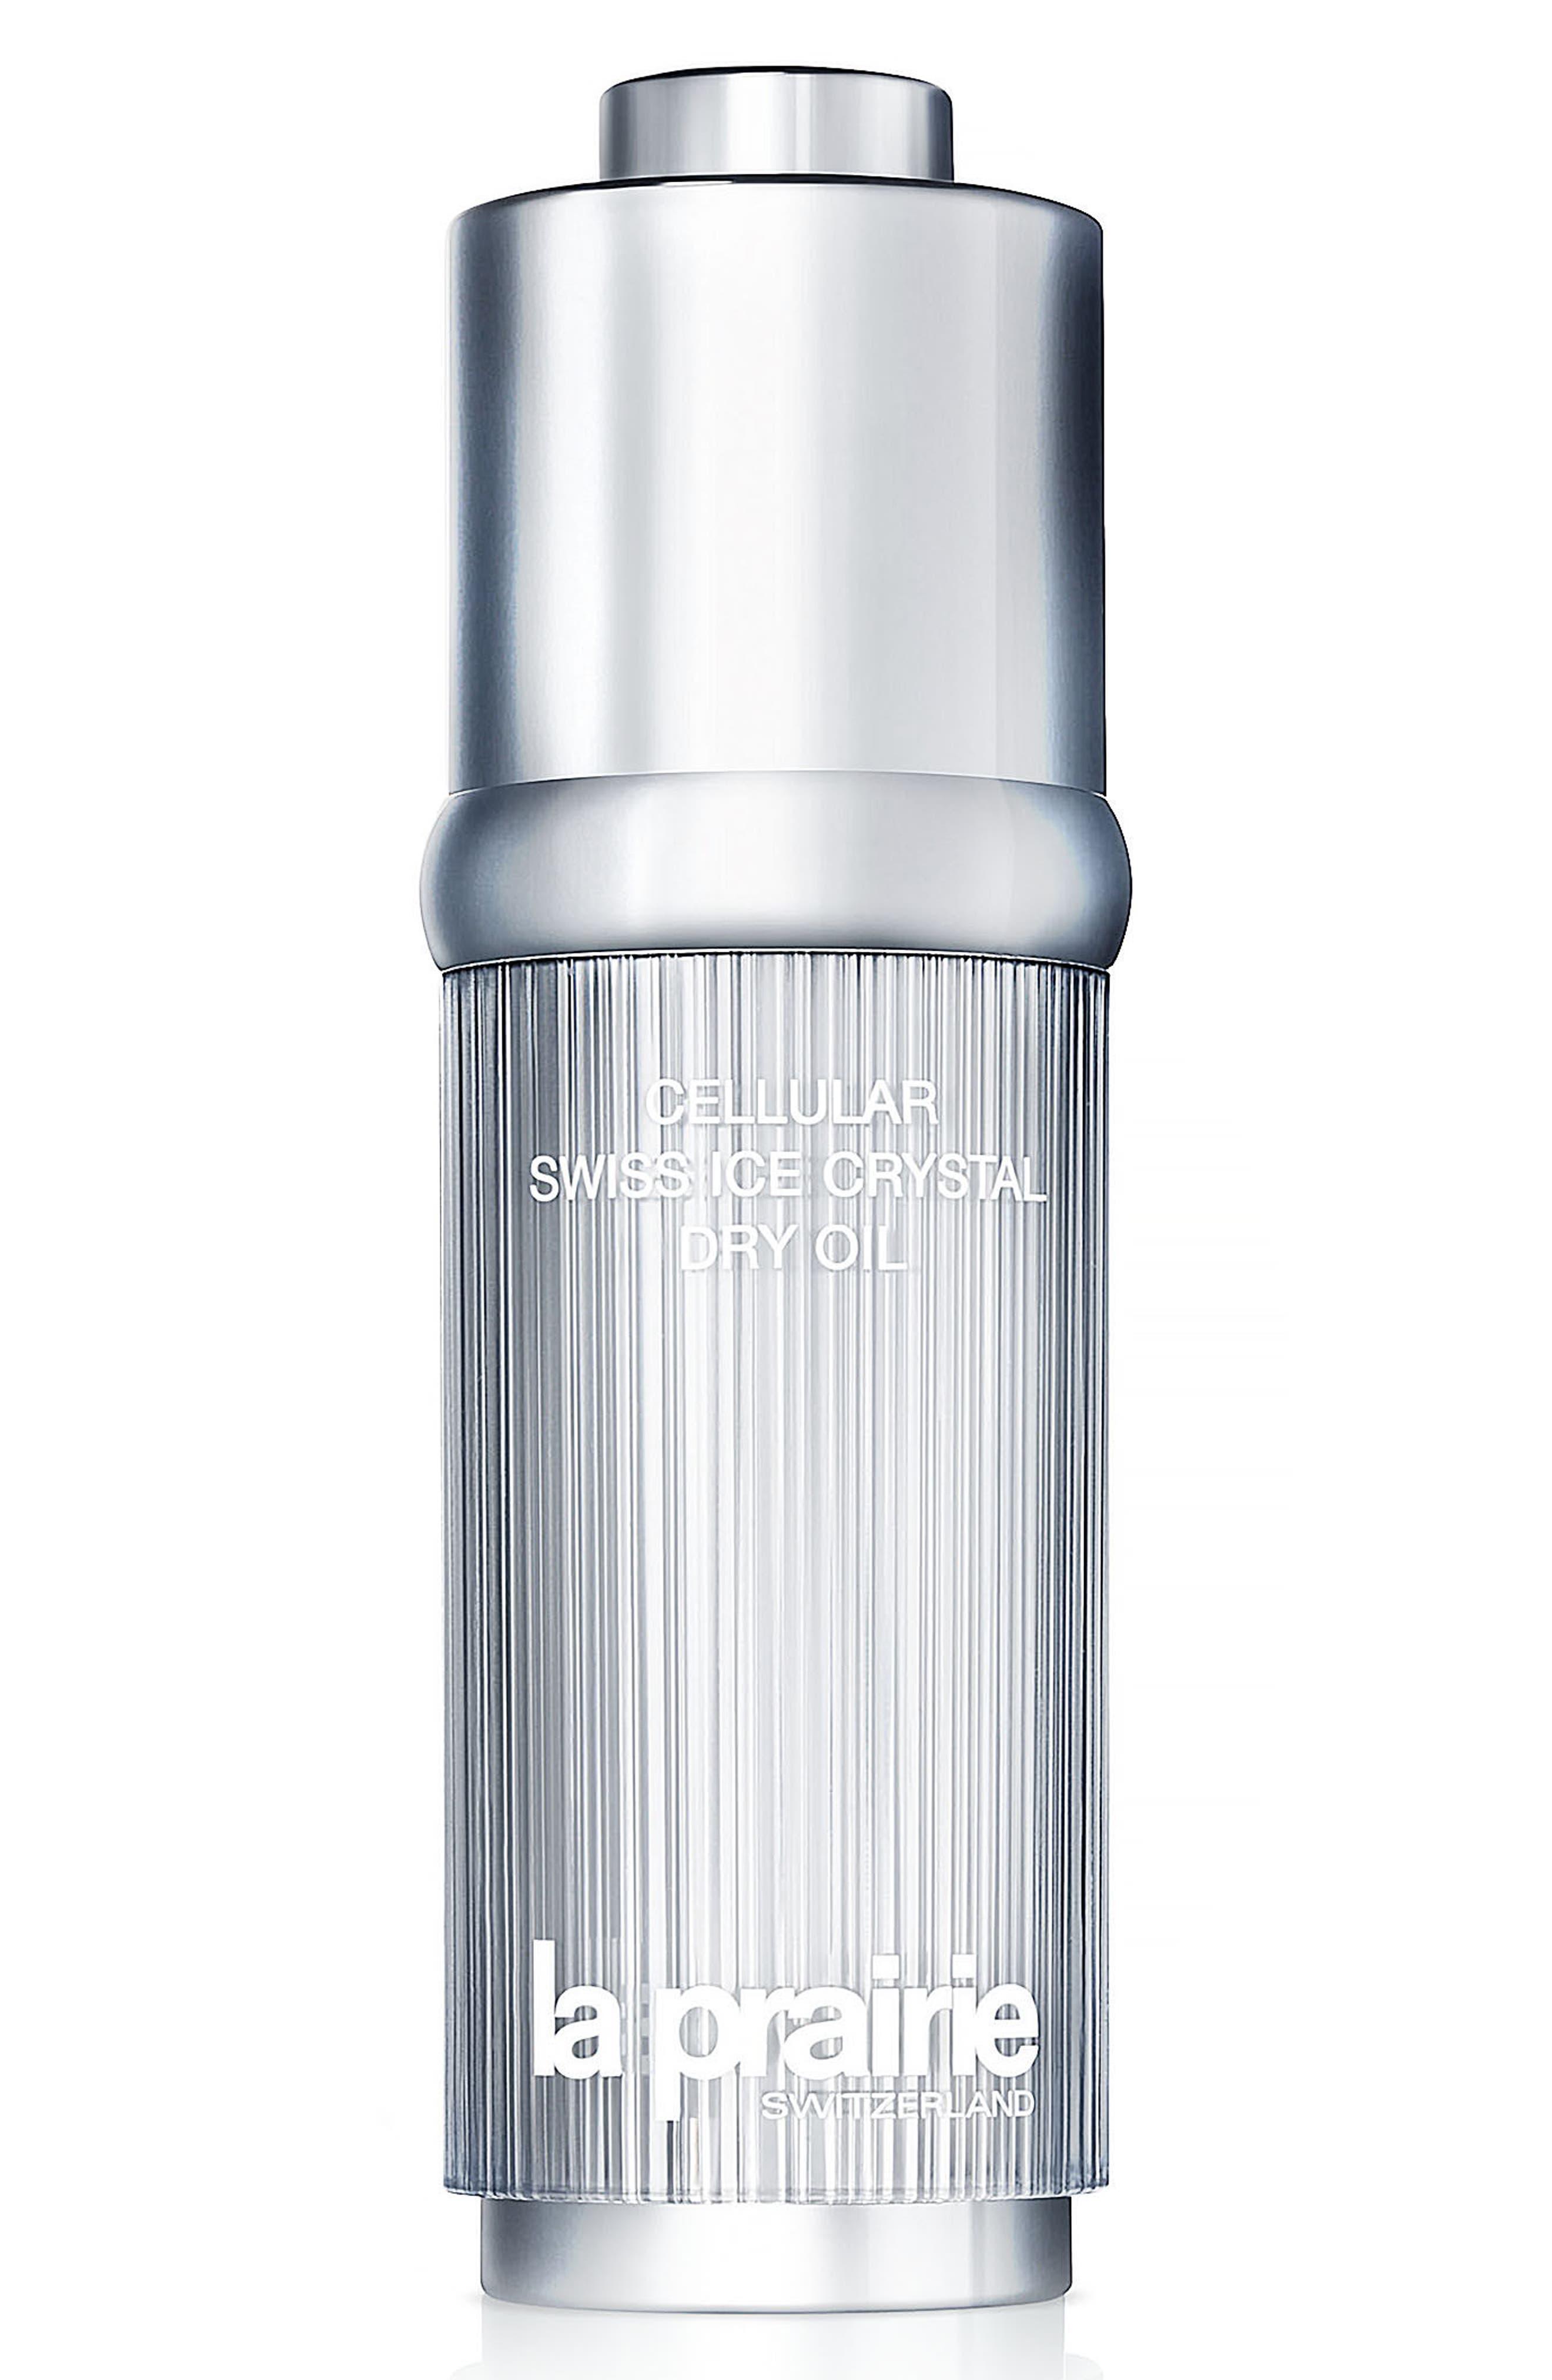 Alternate Image 1 Selected - La Prairie Cellular Swiss Ice Crystal Dry Oil